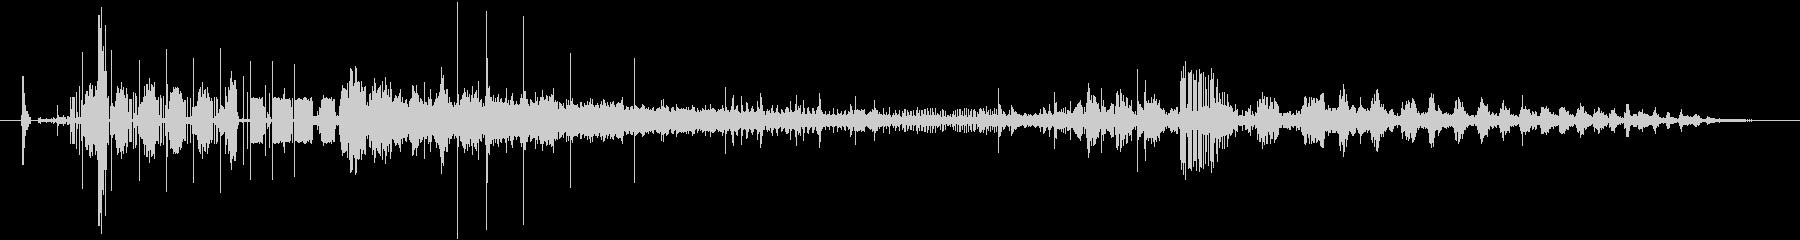 CINEMATIC BEEP 09の未再生の波形